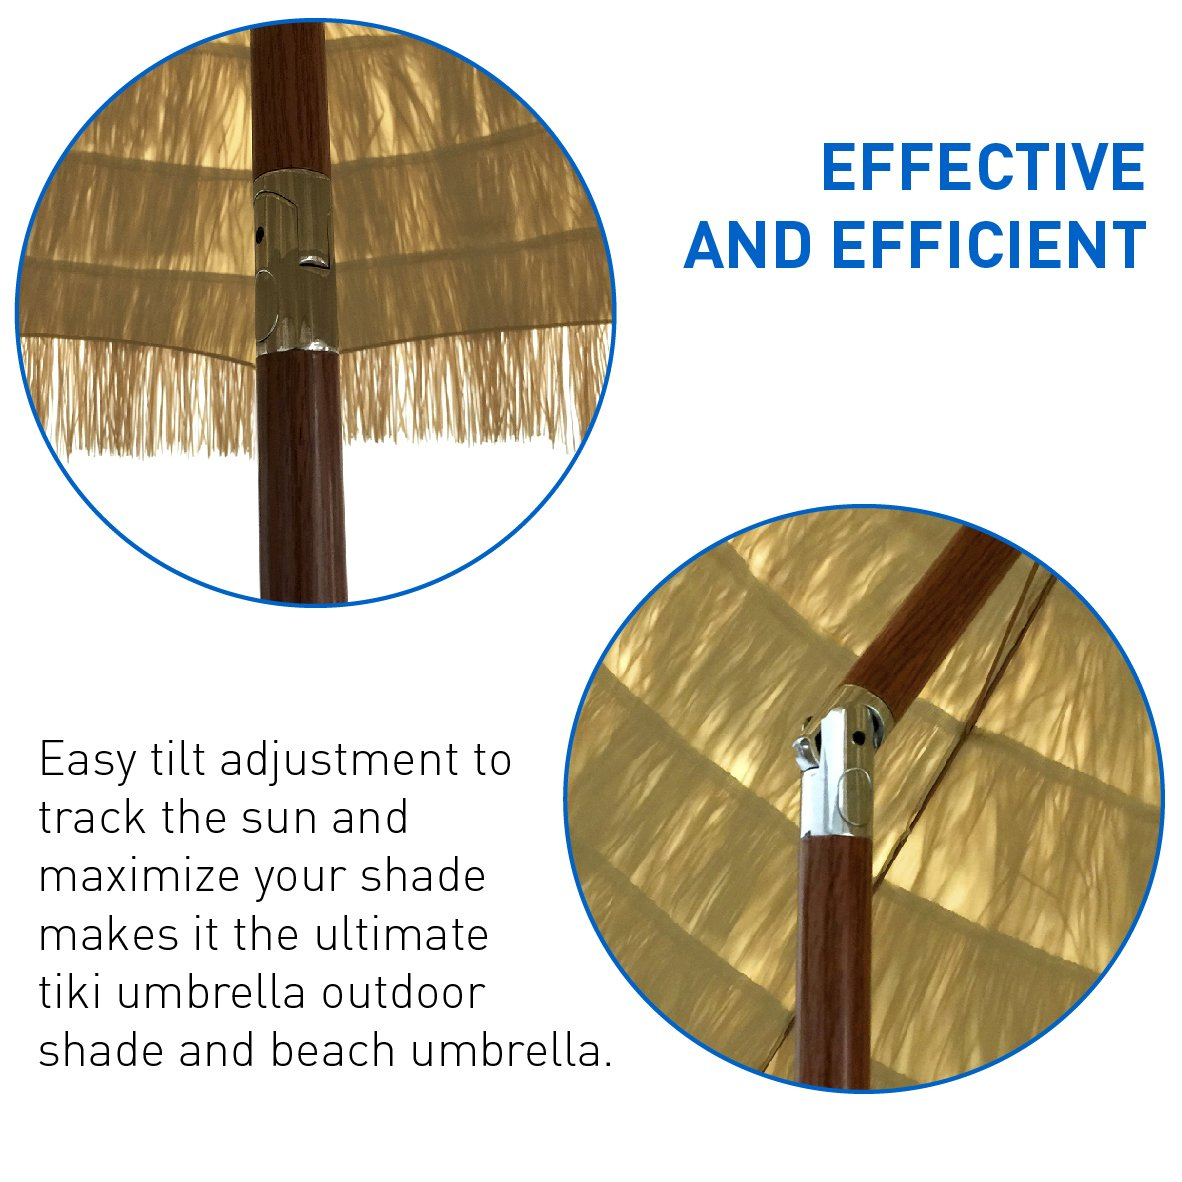 EasyGo – 6.5 Thatch Patio Tiki Umbrella Tropical Palapa Raffia Tiki Hut Hawaiian Hula Beach Umbrella